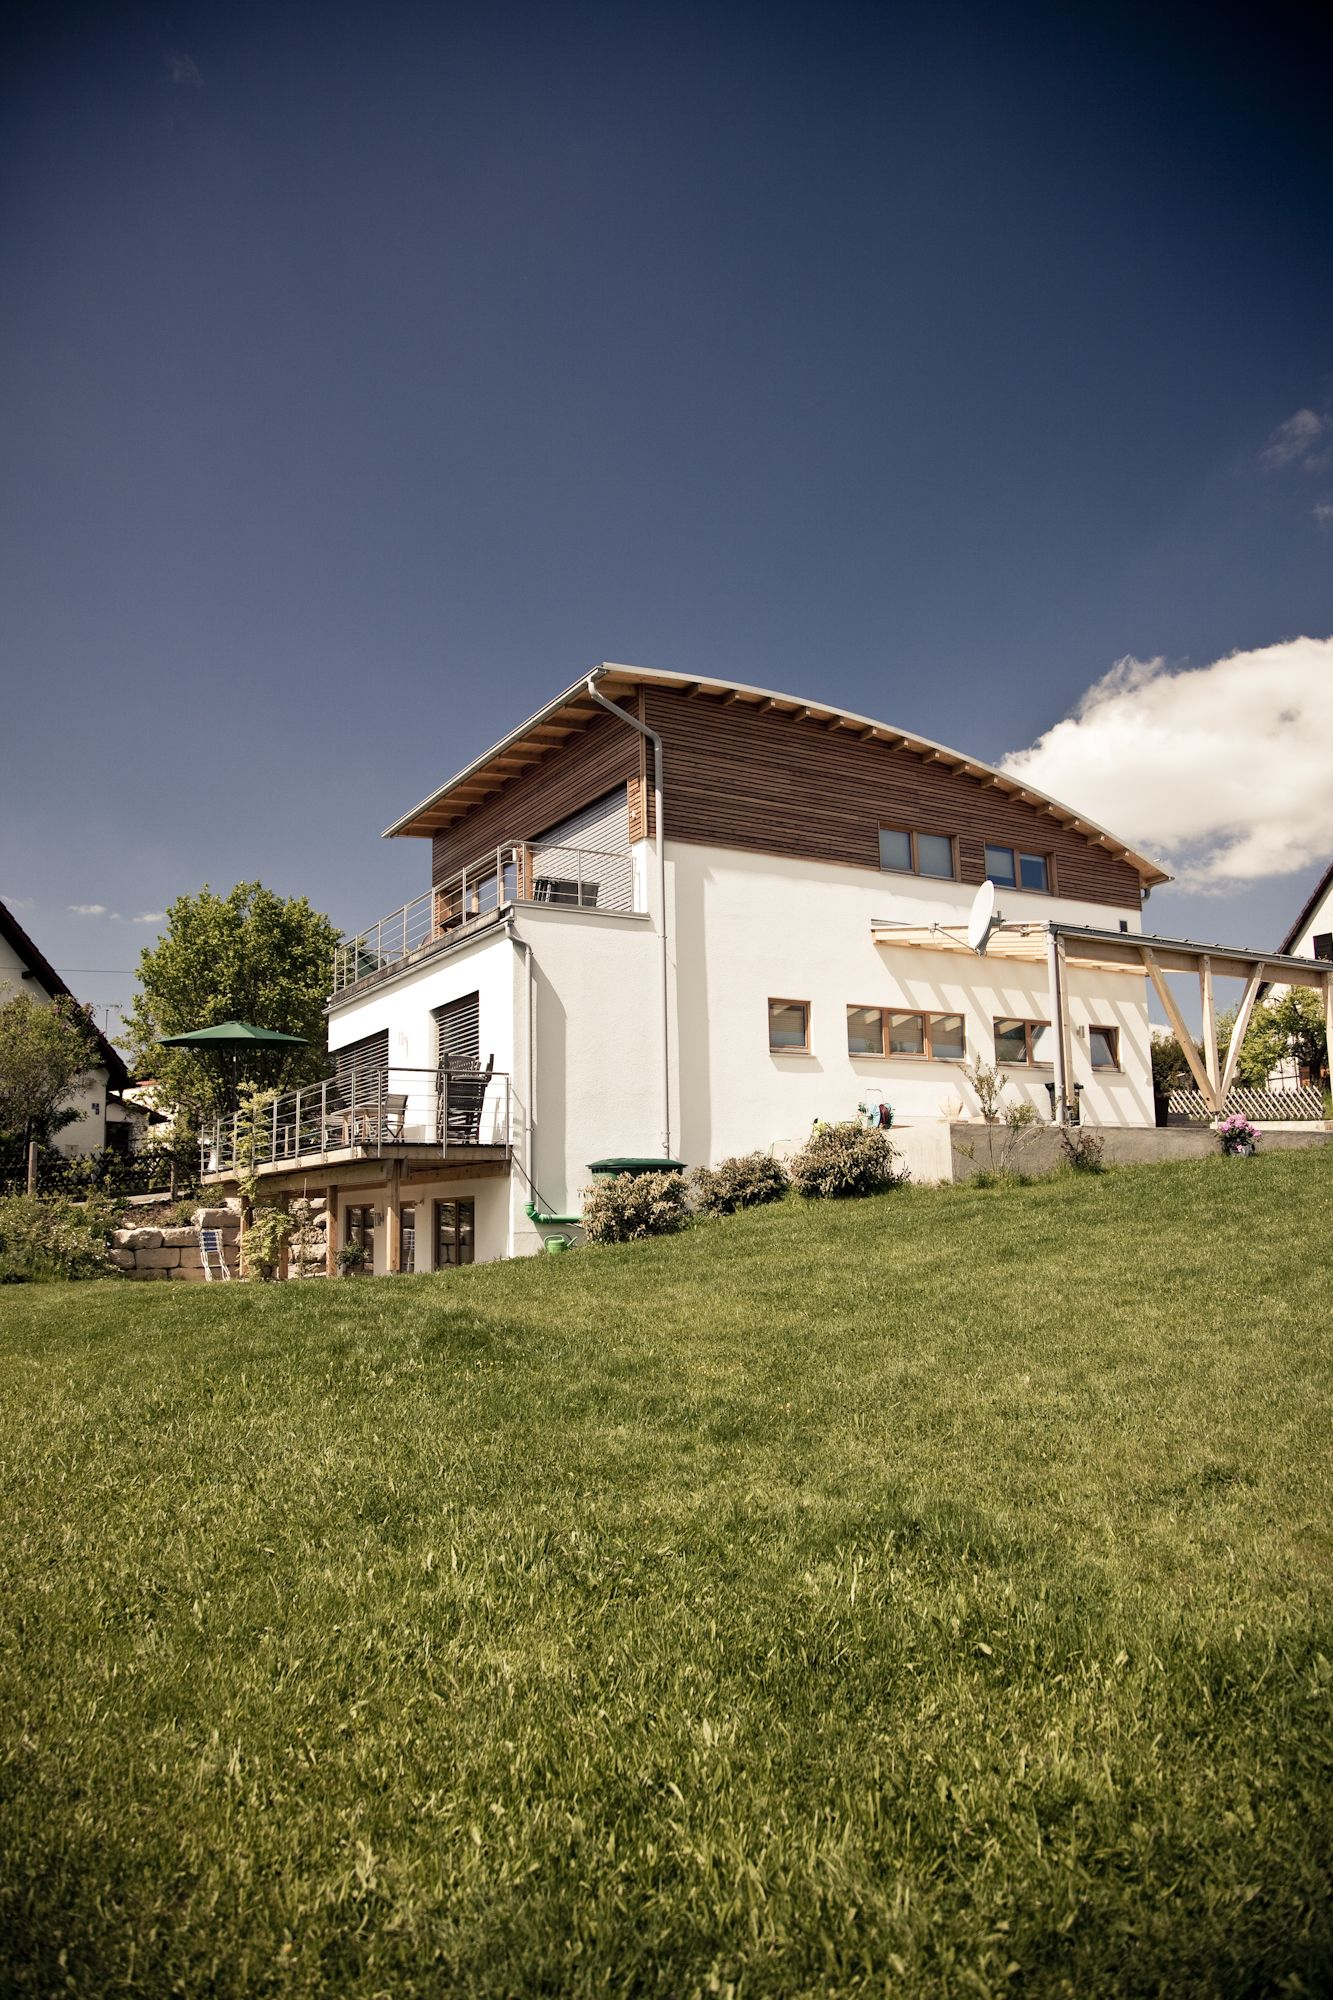 Fichtl Holzhaus